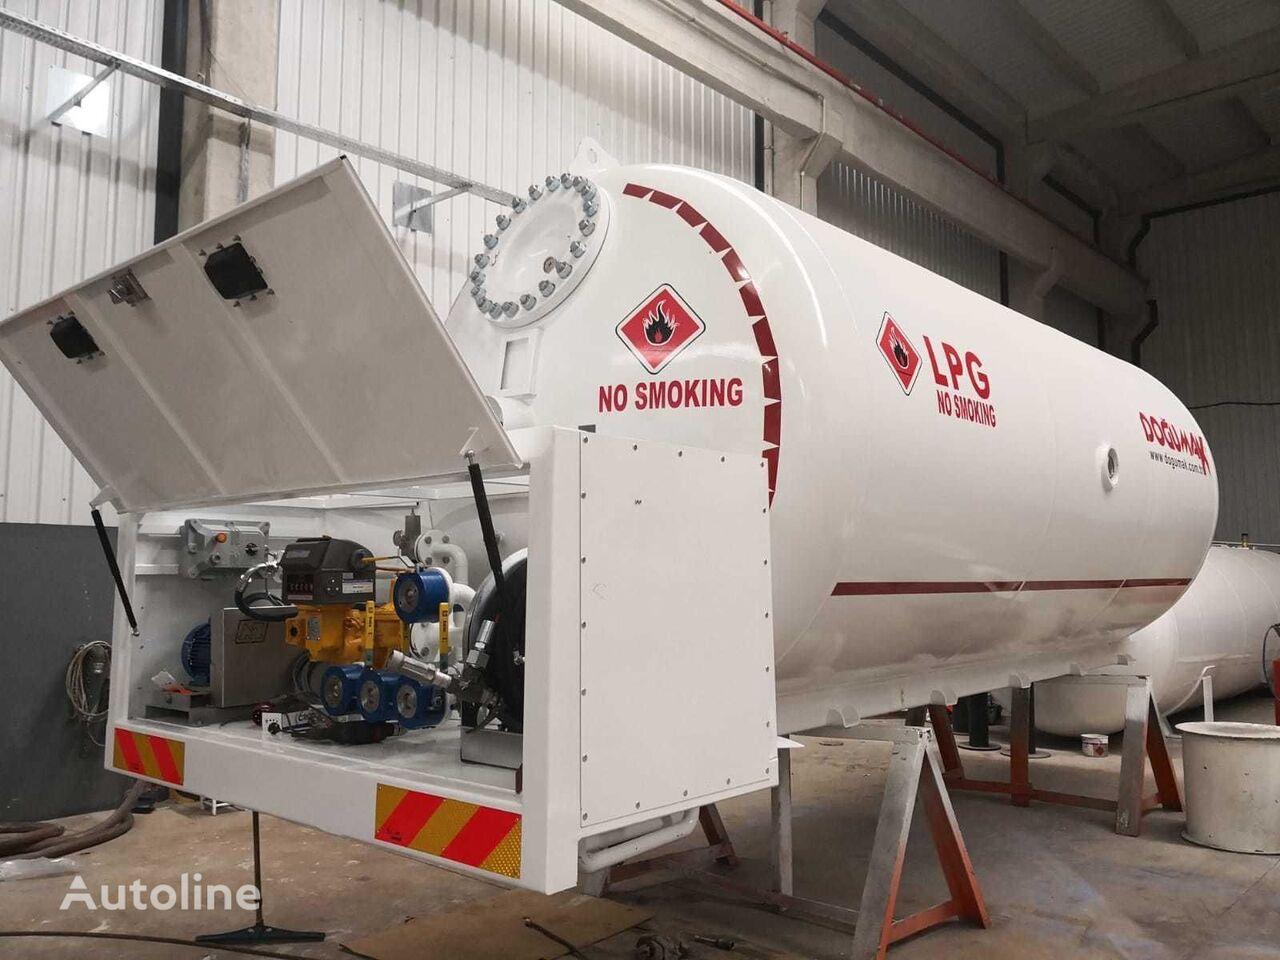 nowa cysterna gazowa DOĞUMAK bobtail tank 24000 liter gas, LPG , GPL , GAZ, PROPANE, BUTANE